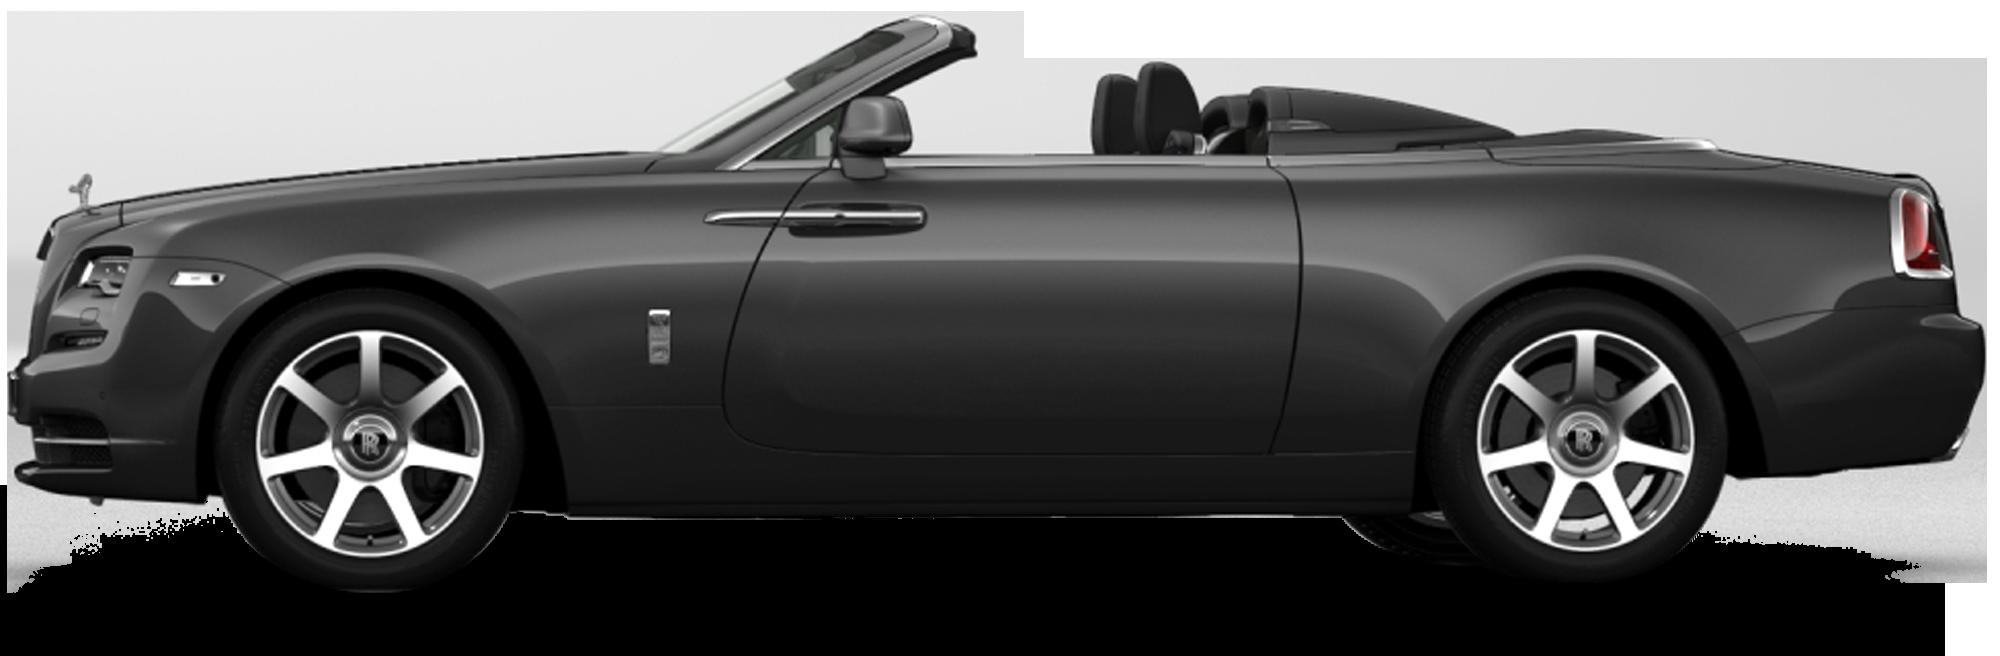 2021 Rolls-Royce Dawn Convertible